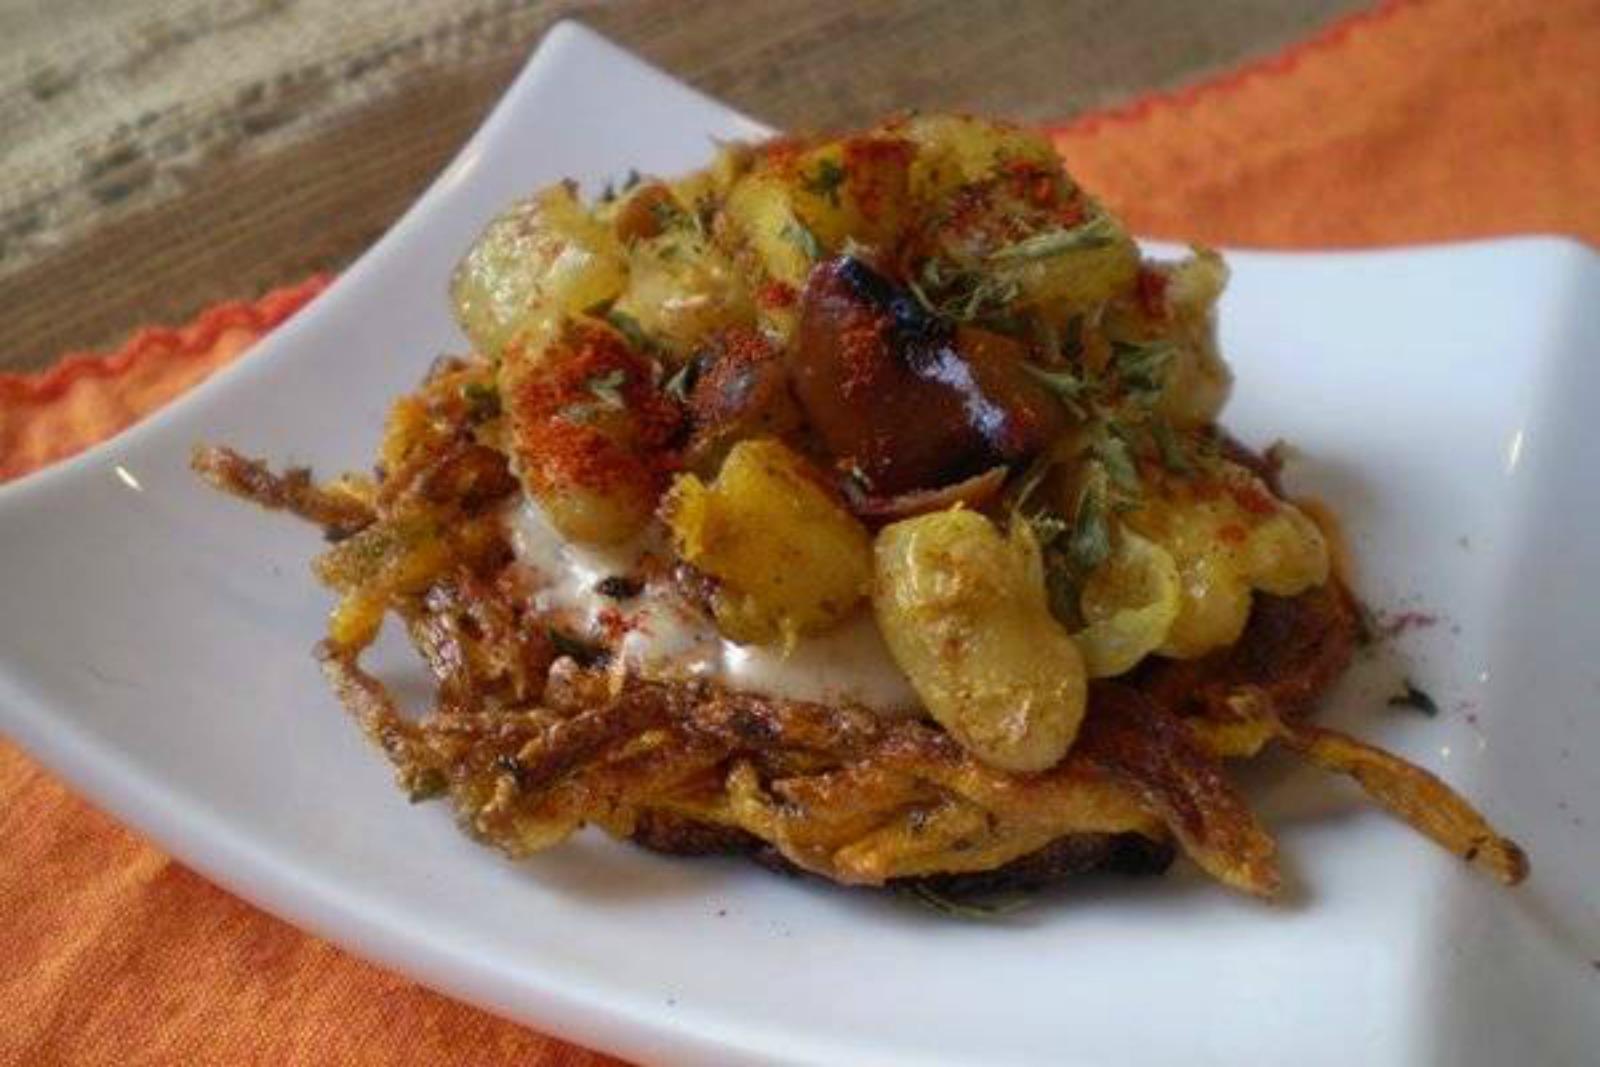 Vegan Sweet Potato Latkes With Curried Onion-Apple-White Beans